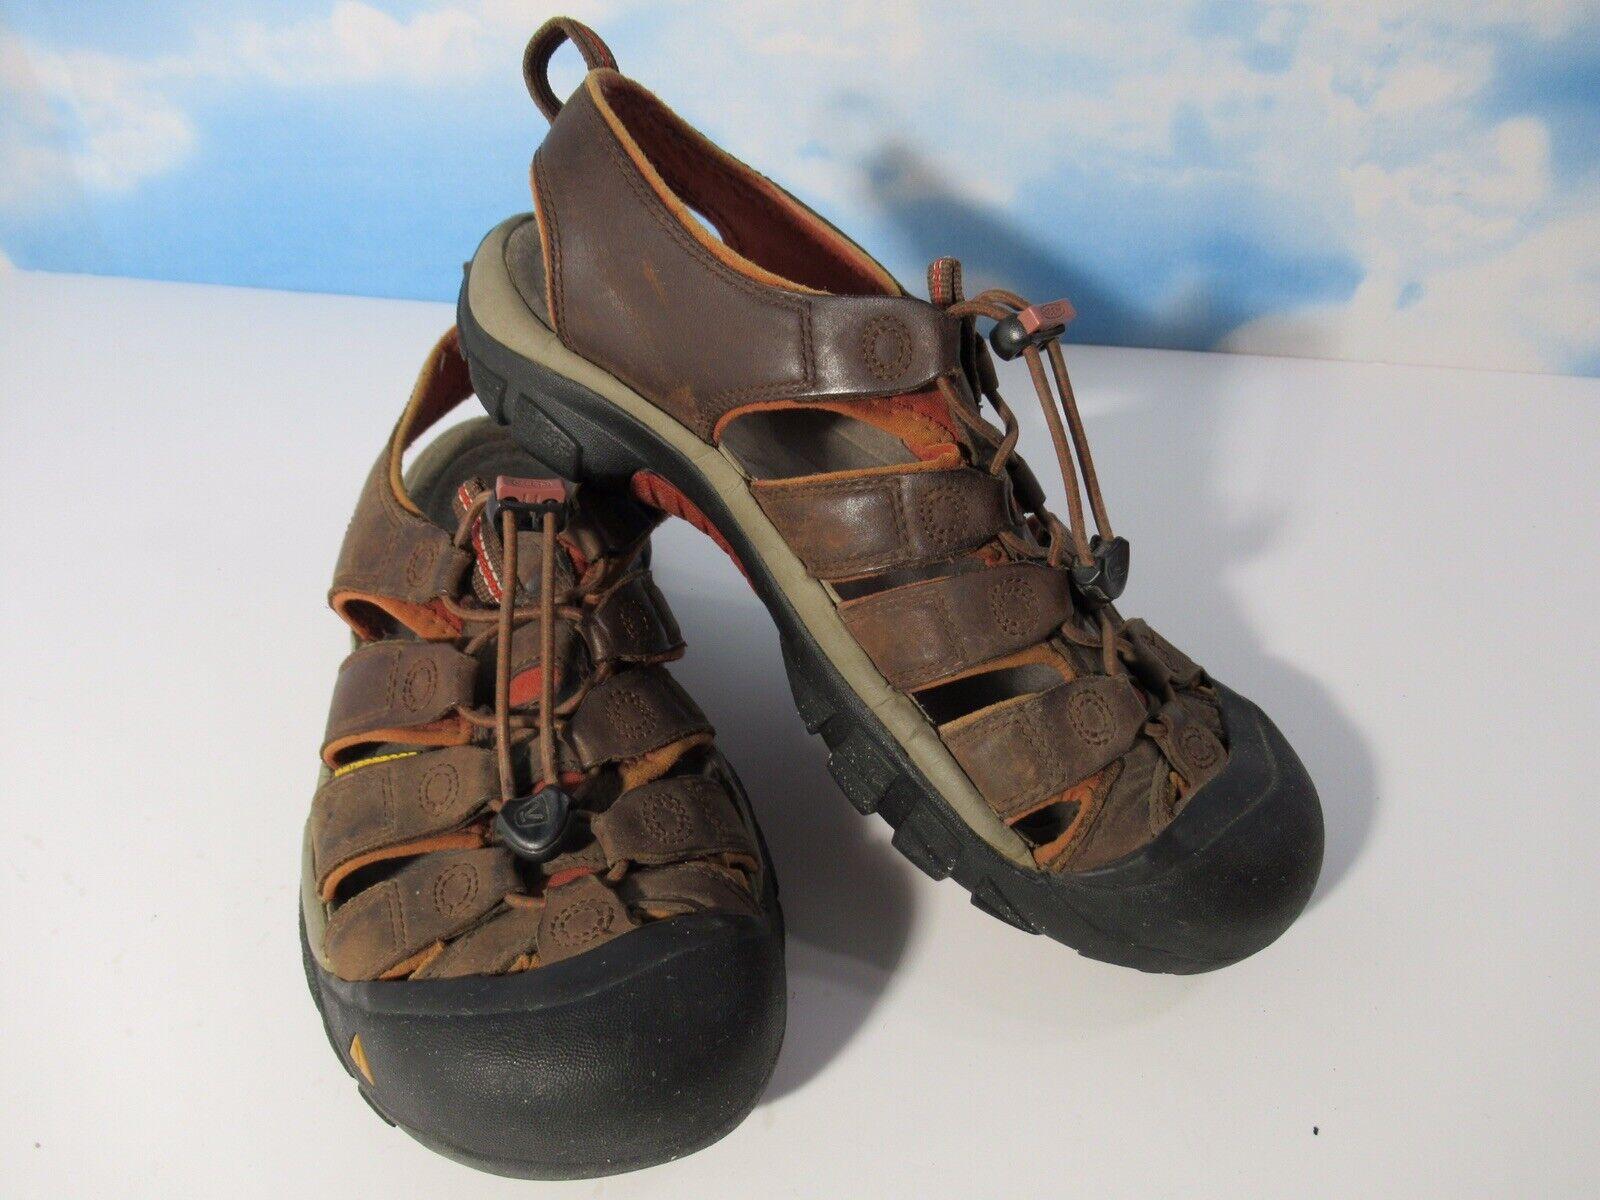 Keen NEWPORT Men's Brown Leather Sport Hiking Sandals Size US 9  1010121